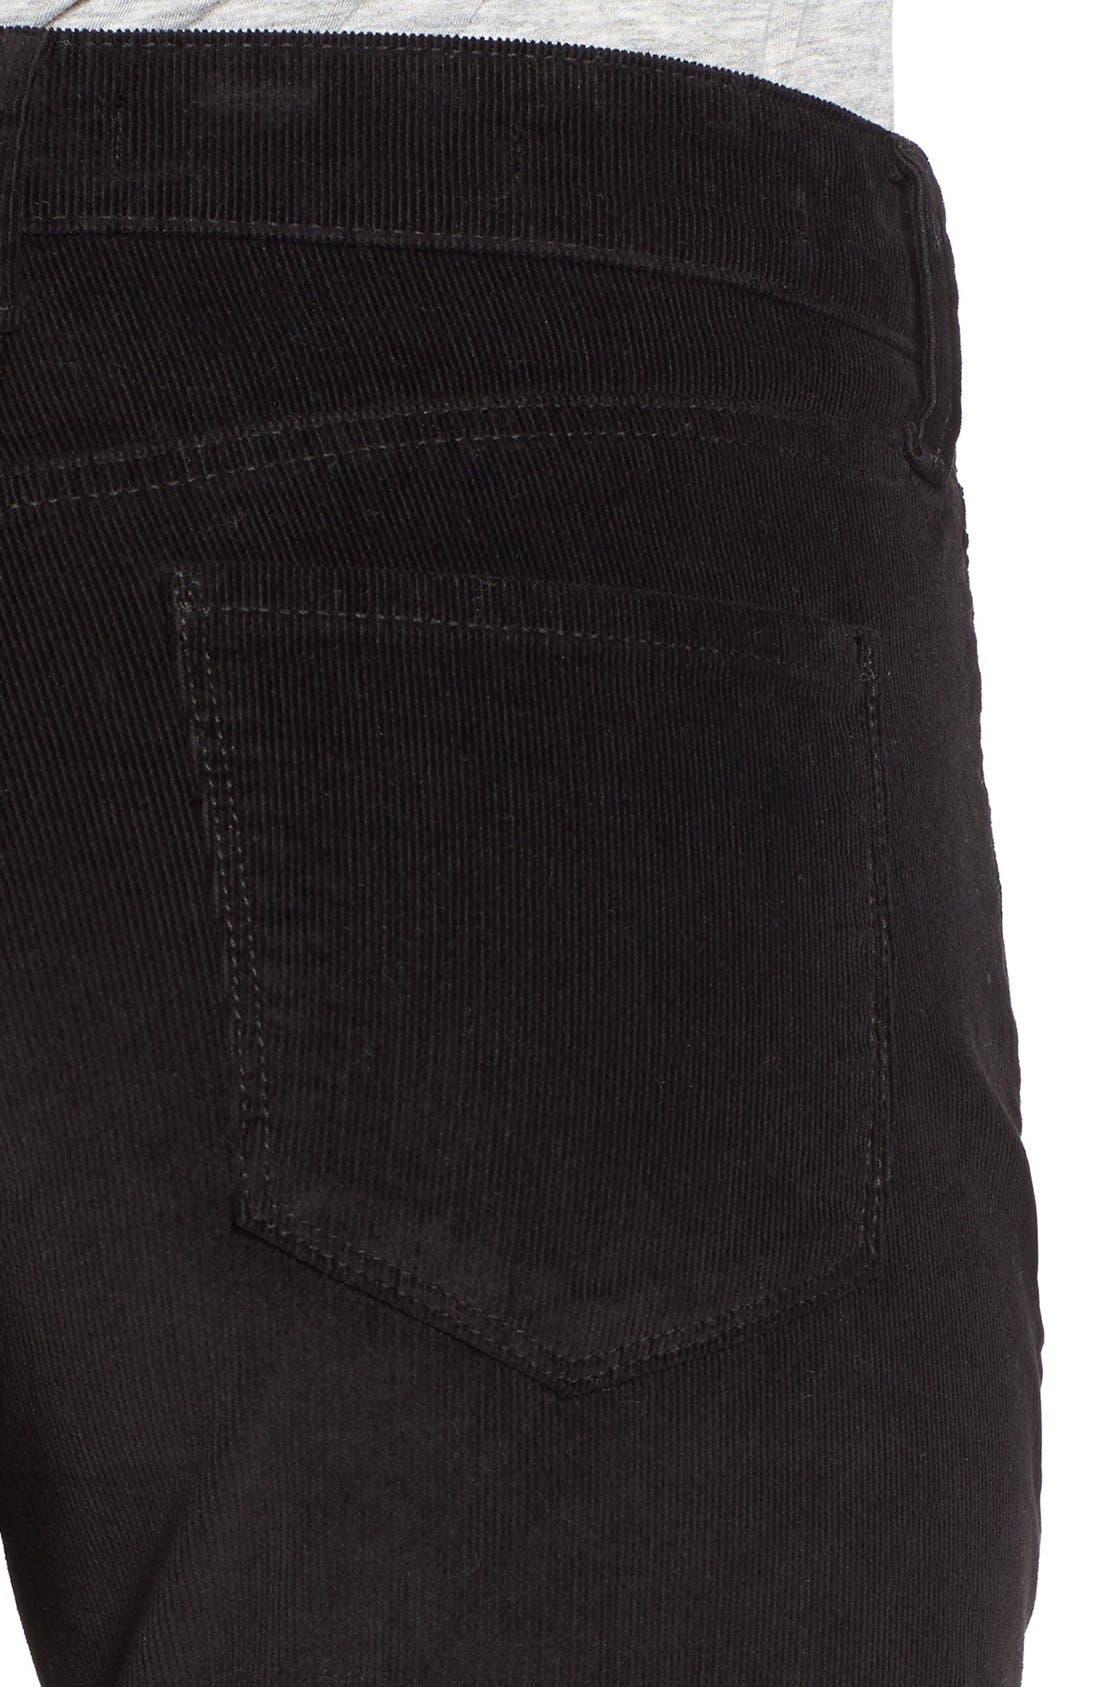 'Alina' Skinny Stretch Corduroy Pants,                             Alternate thumbnail 4, color,                             001